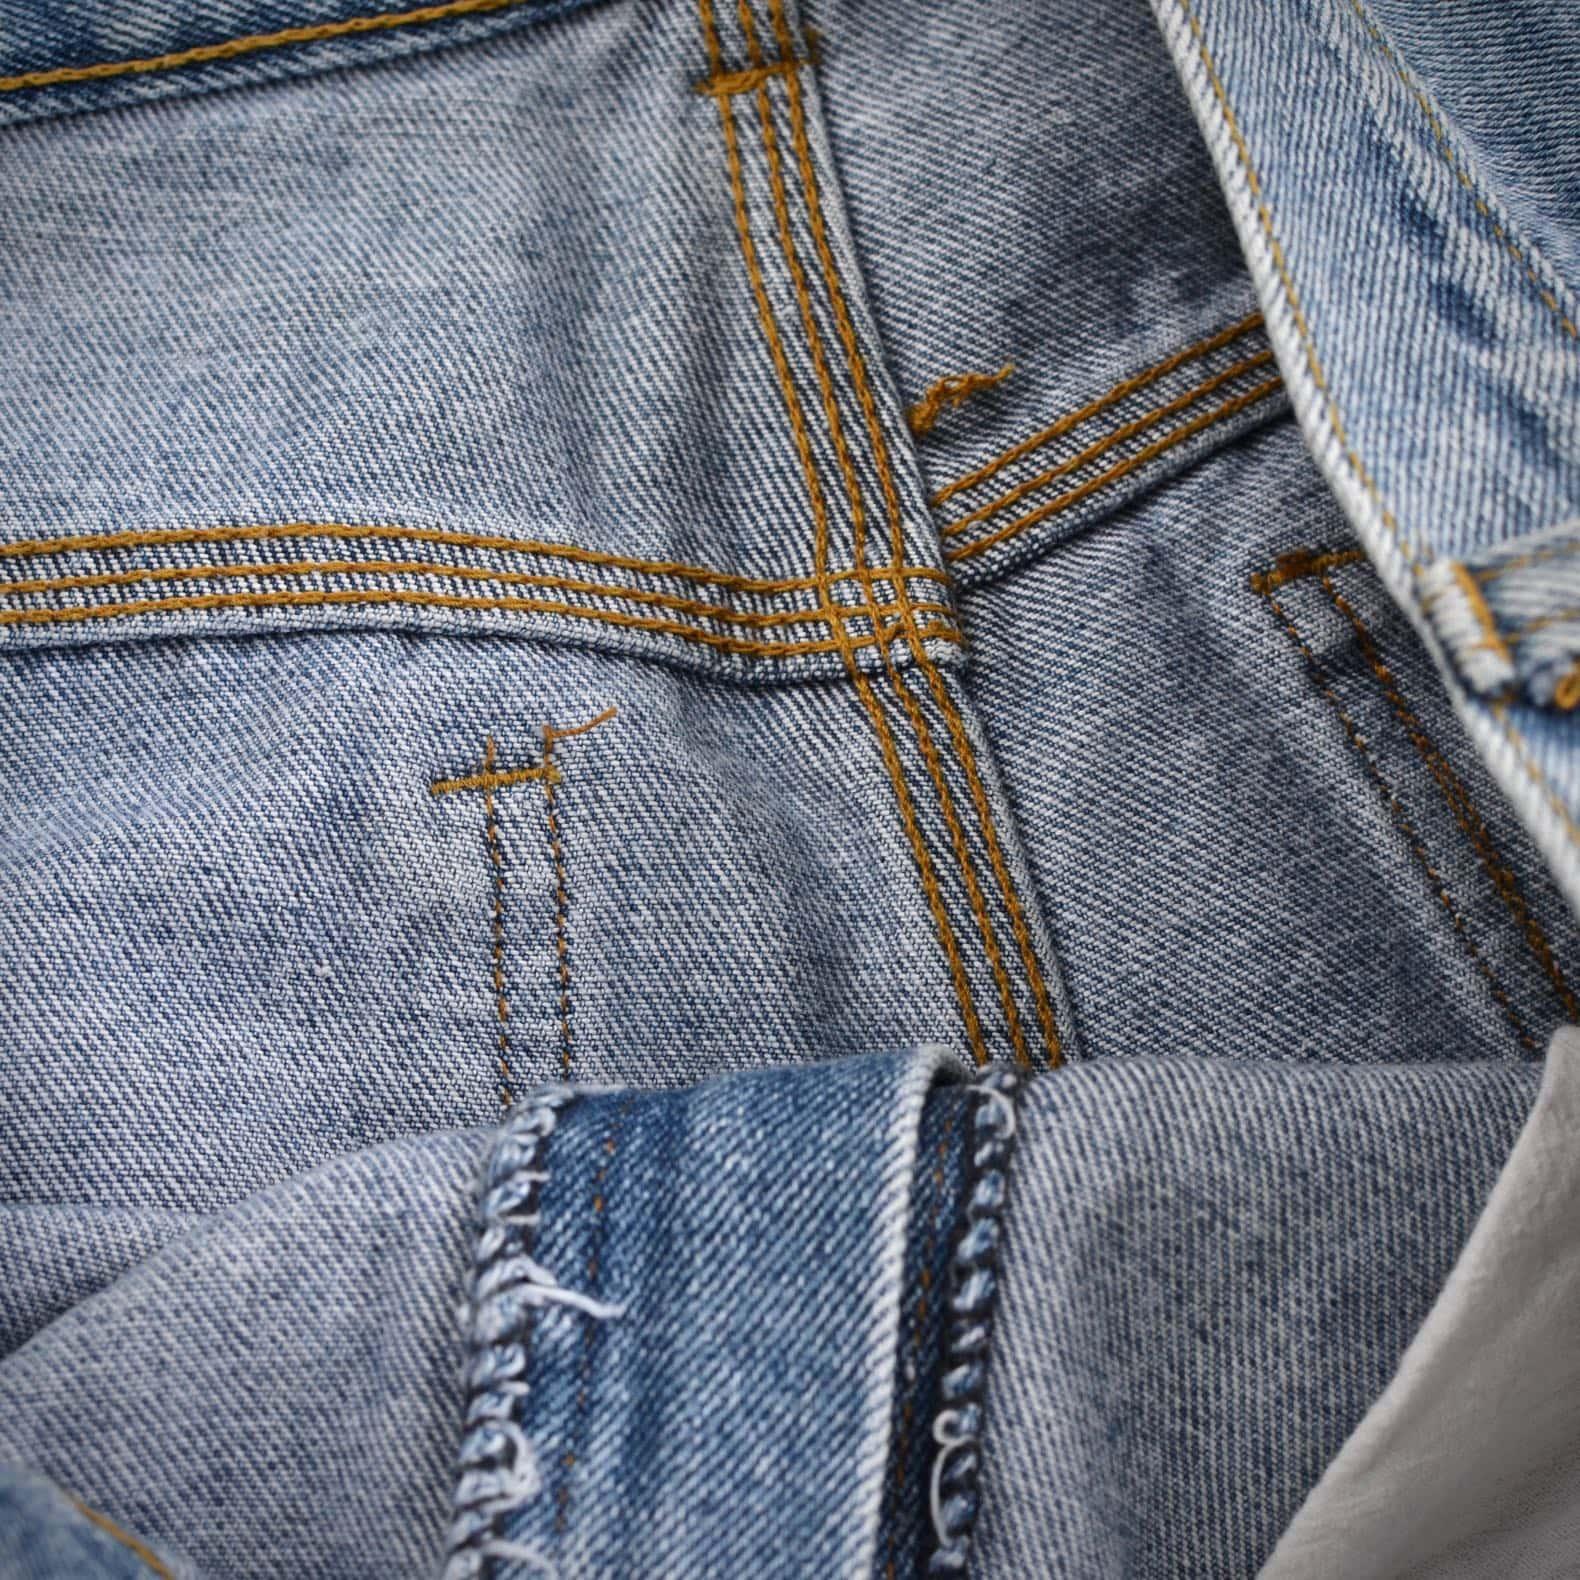 couture triple stitchng